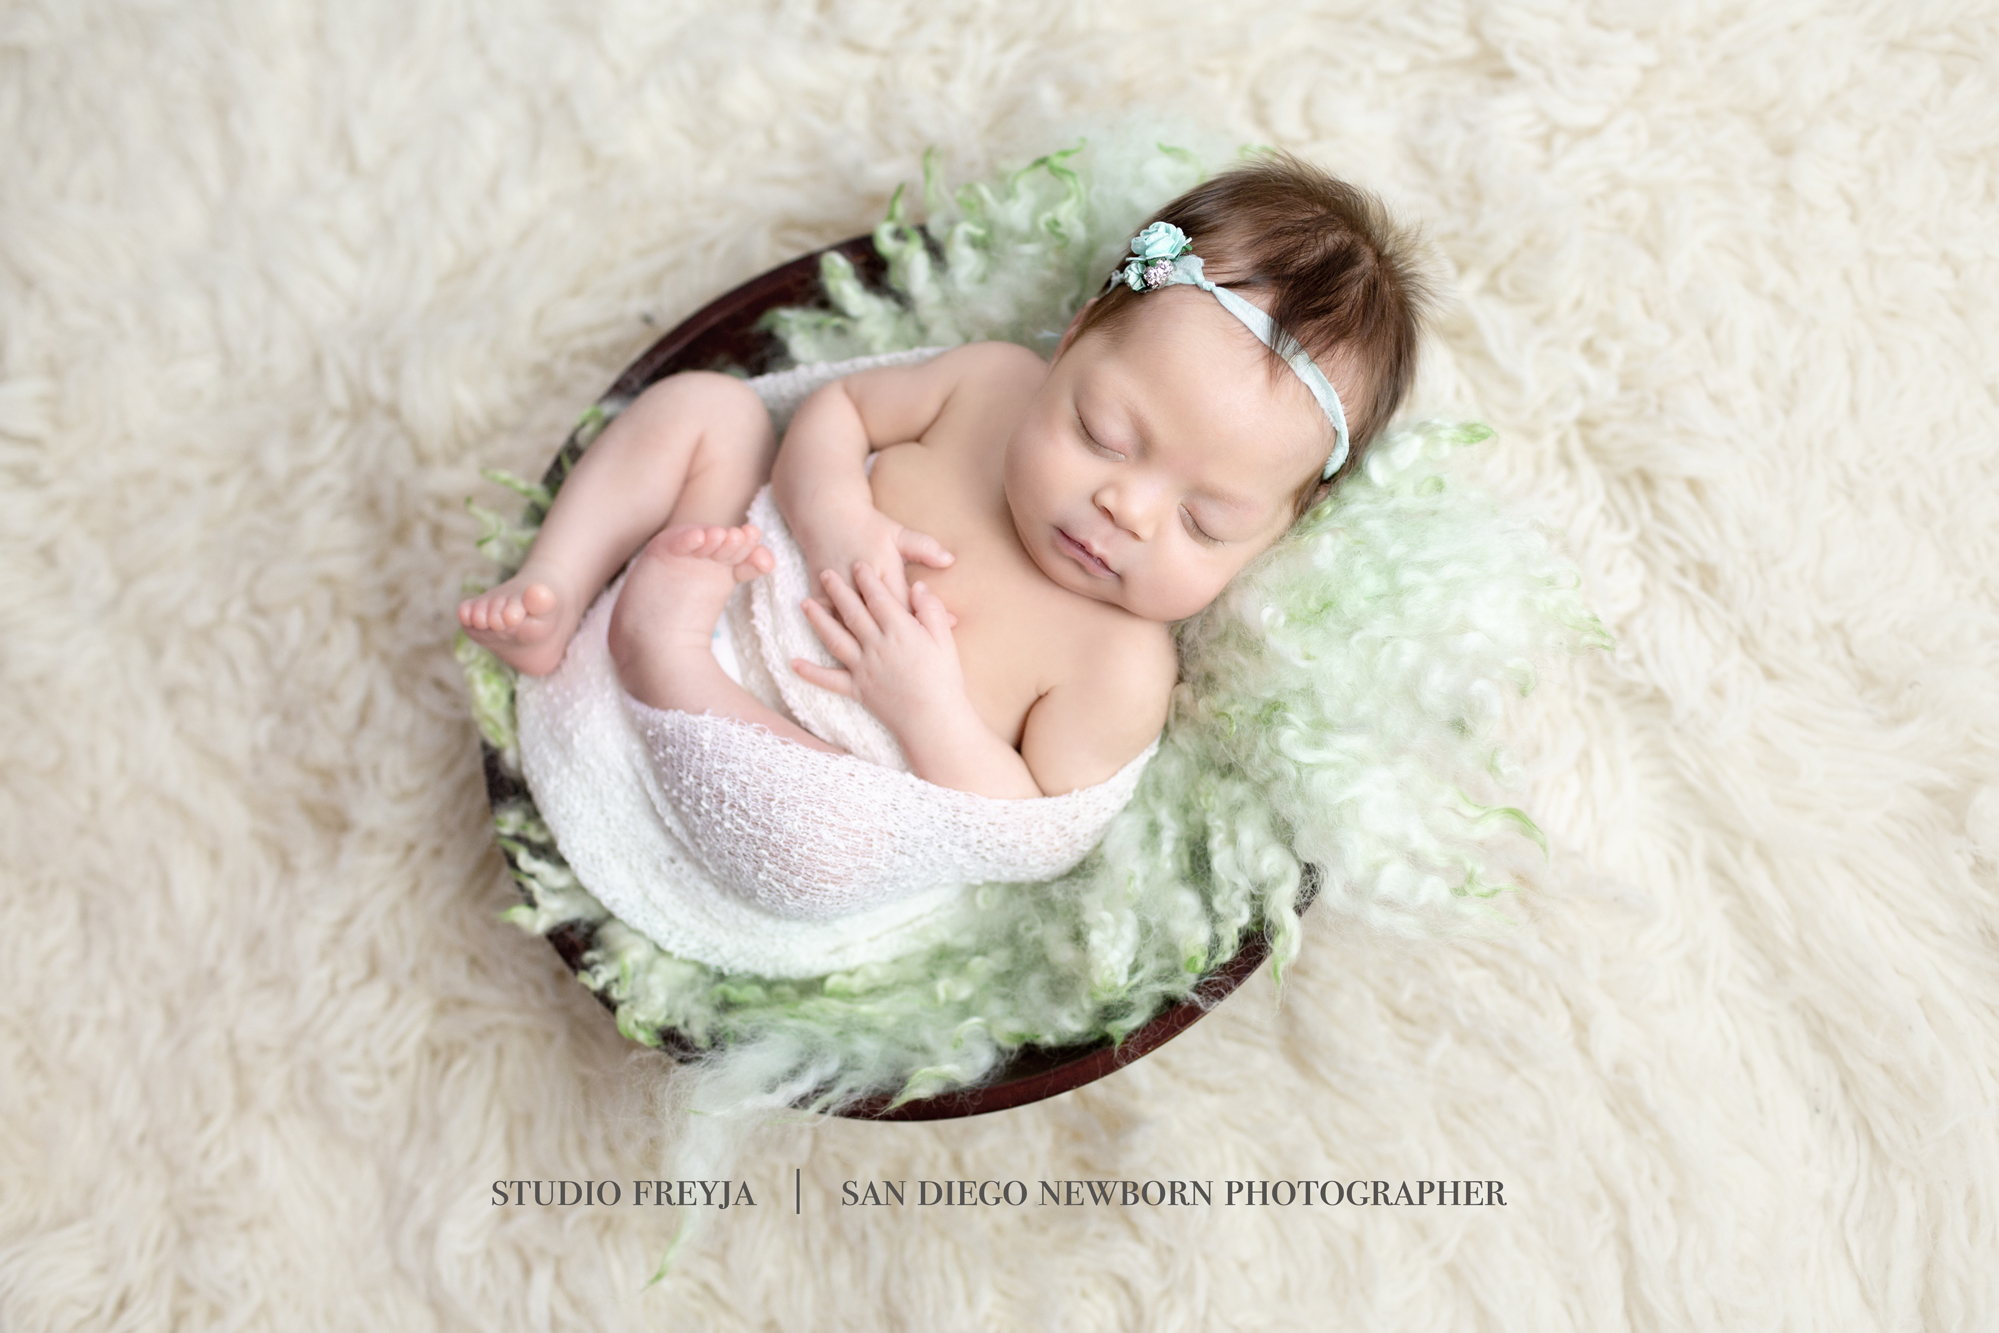 Raylee Newborn Session Copyright Studio Freyja  San Diego Newborn Photographer (6 of 7).jpg